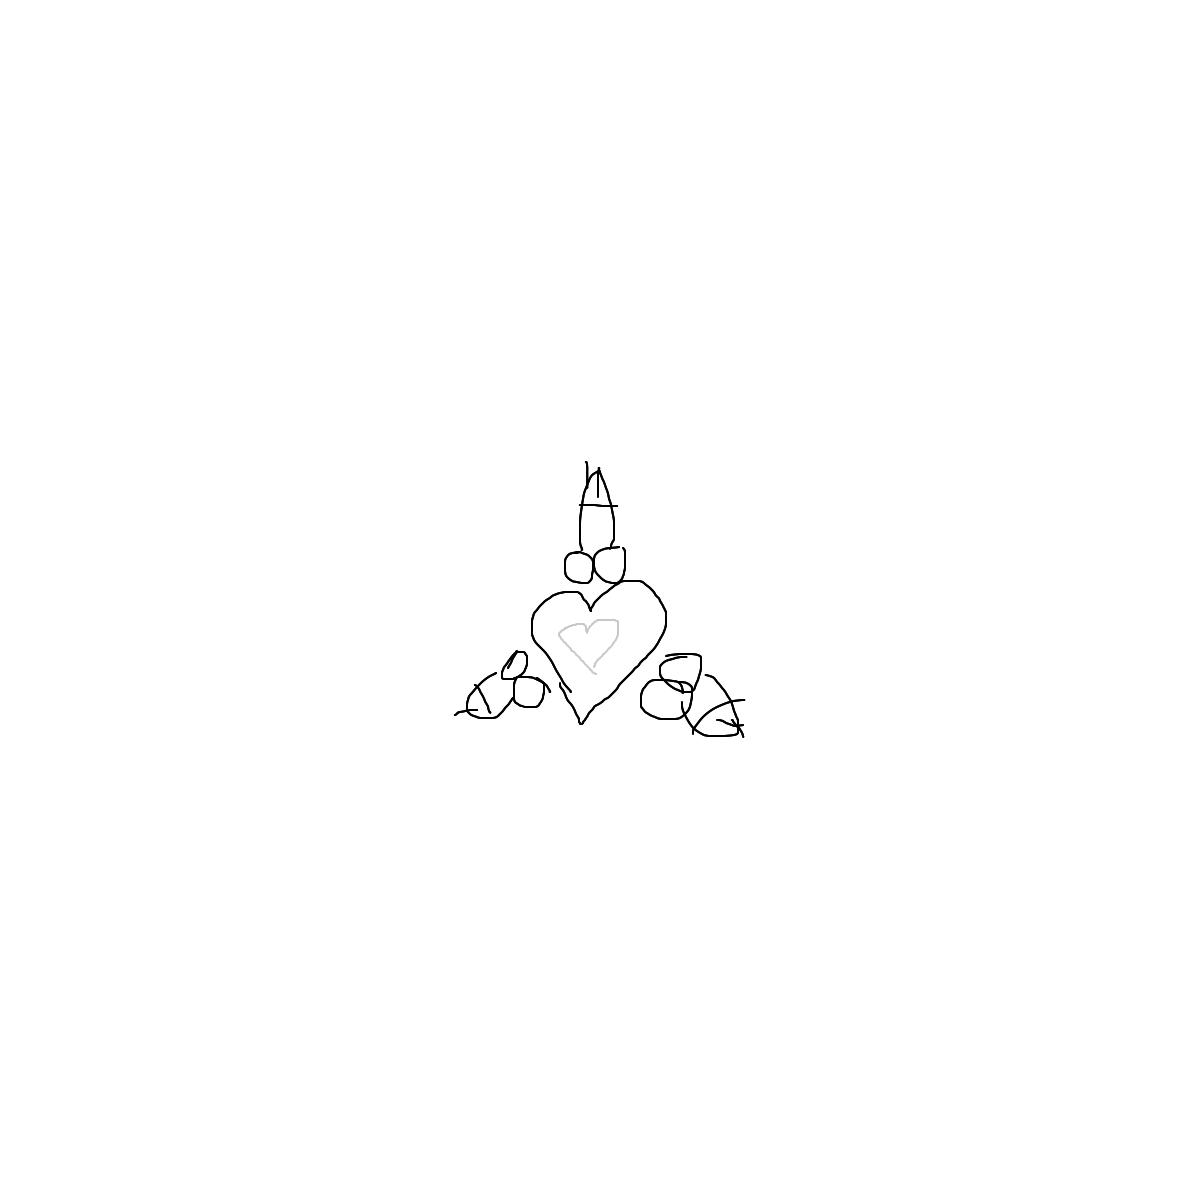 BAAAM drawing#23076 lat:51.8093338012695300lng: 4.6856093406677250